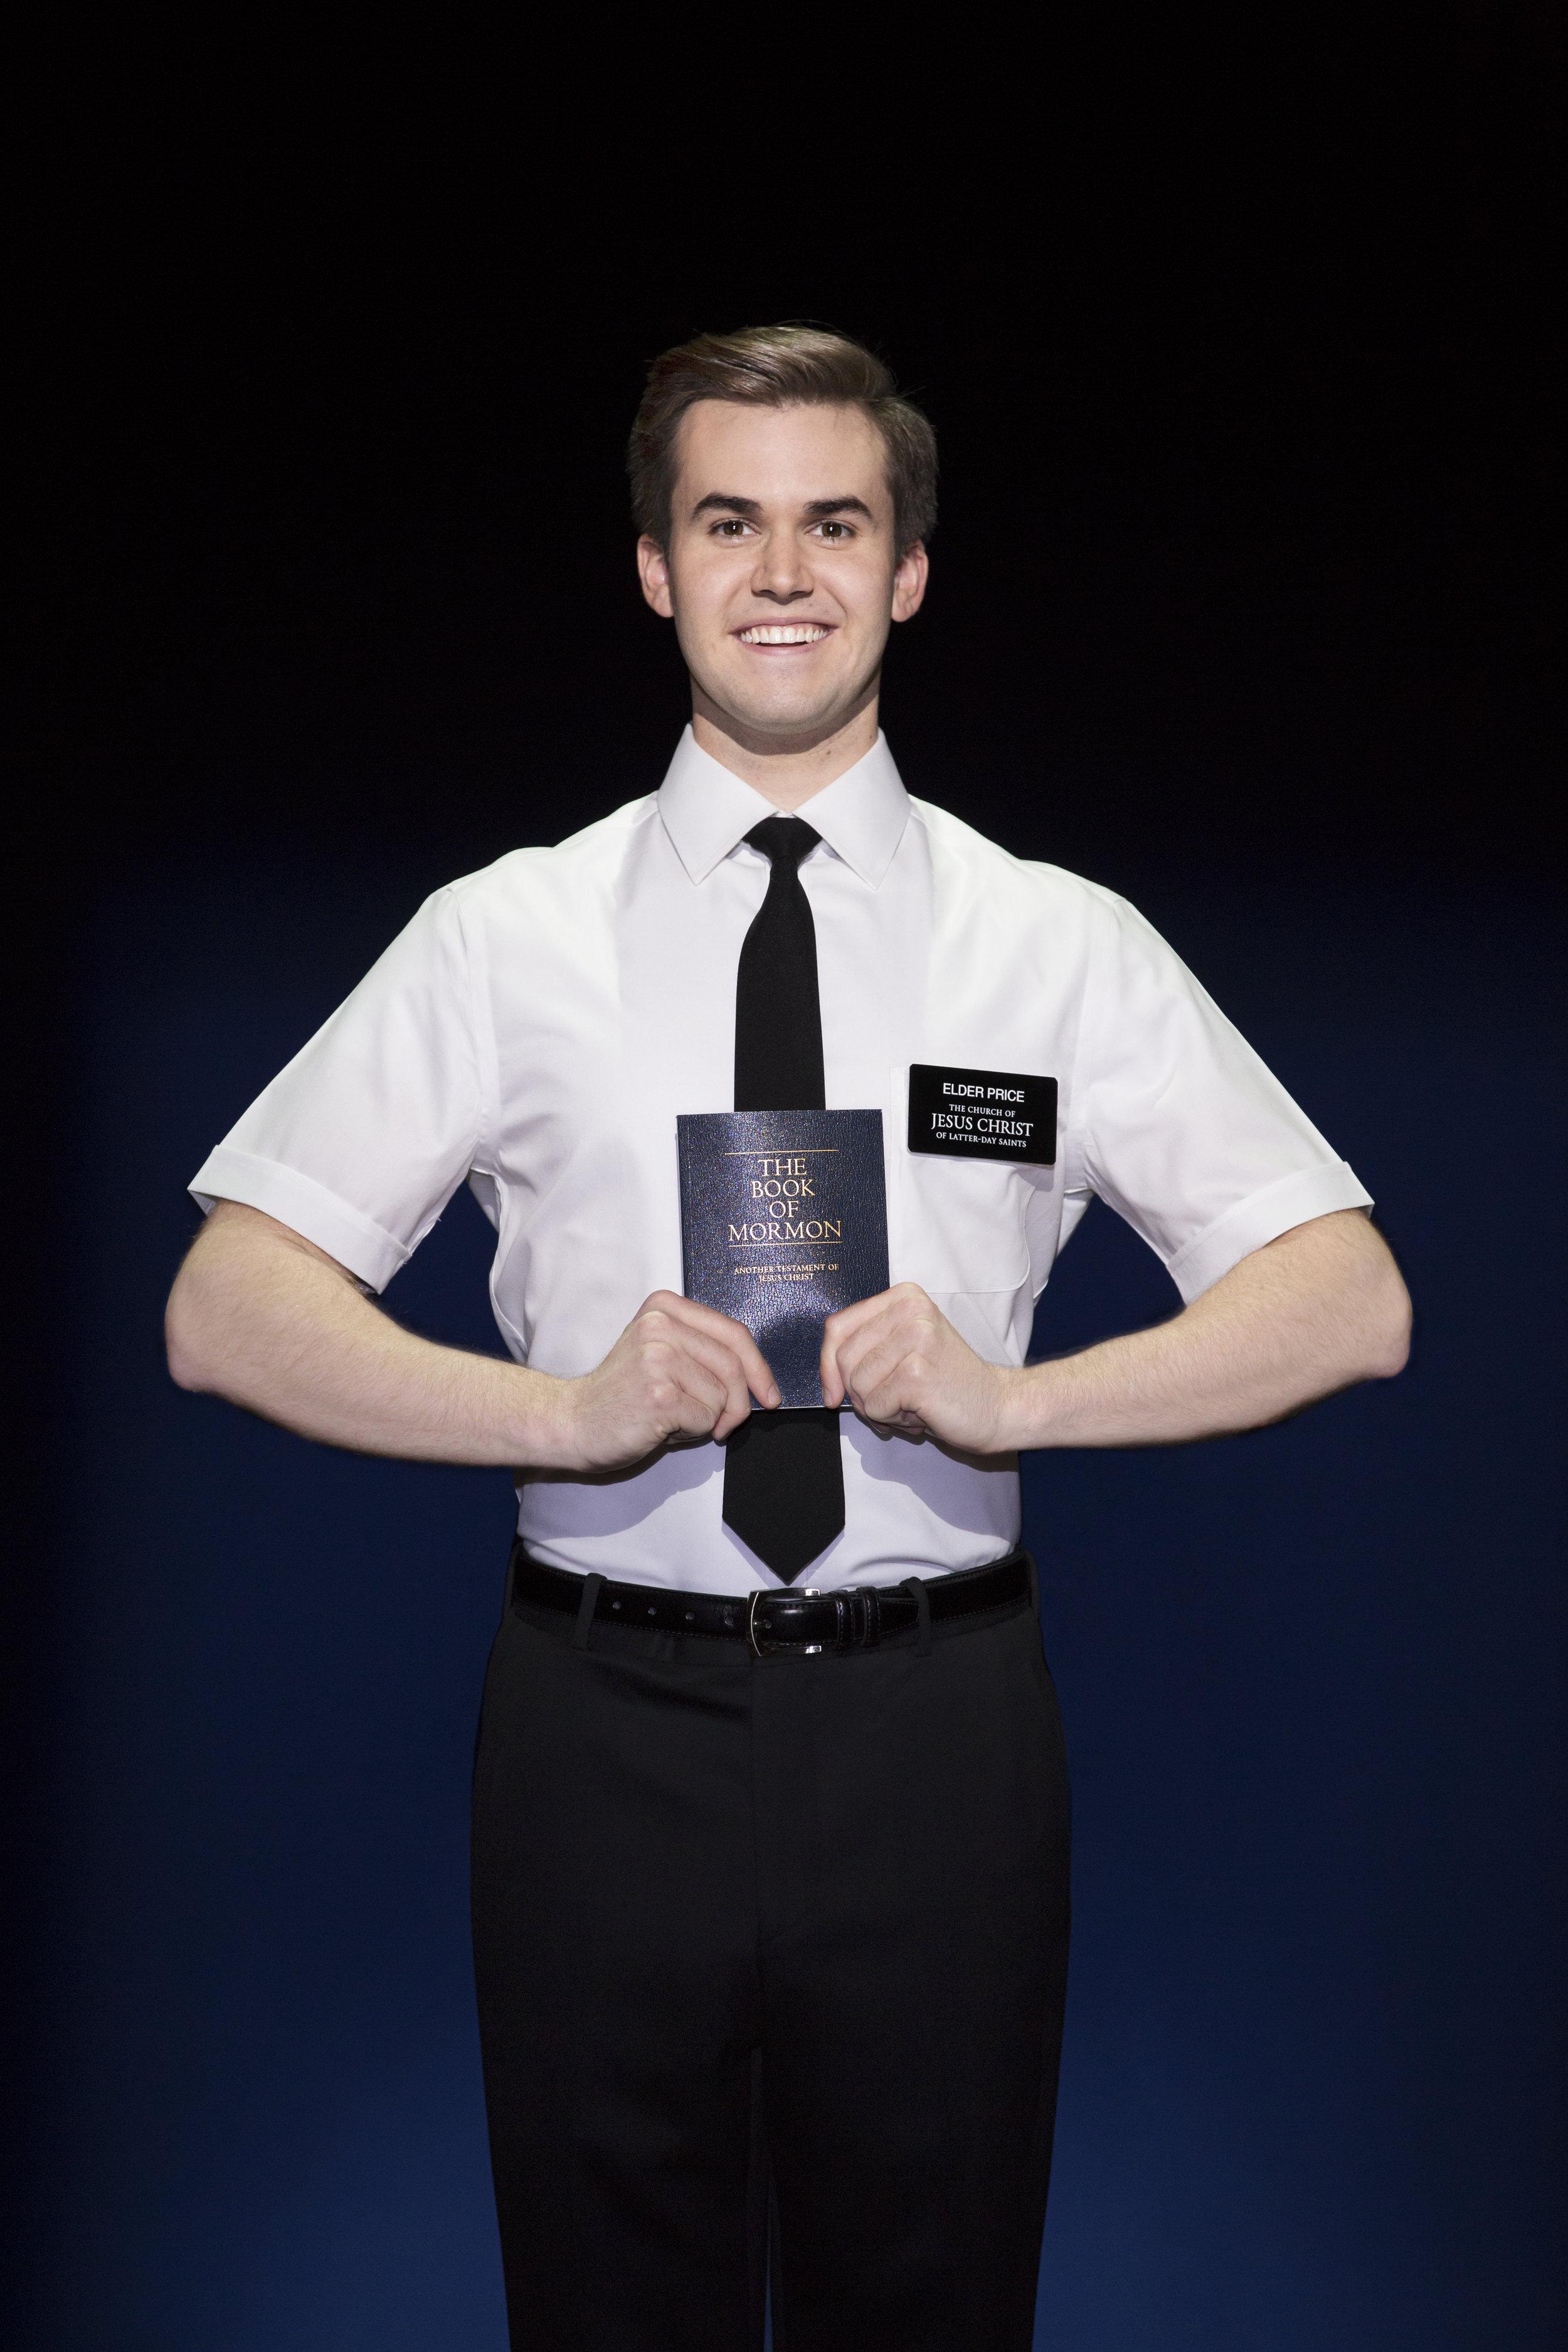 Kevin Clay - The Book of Mormon (c) Julieta Cervantes